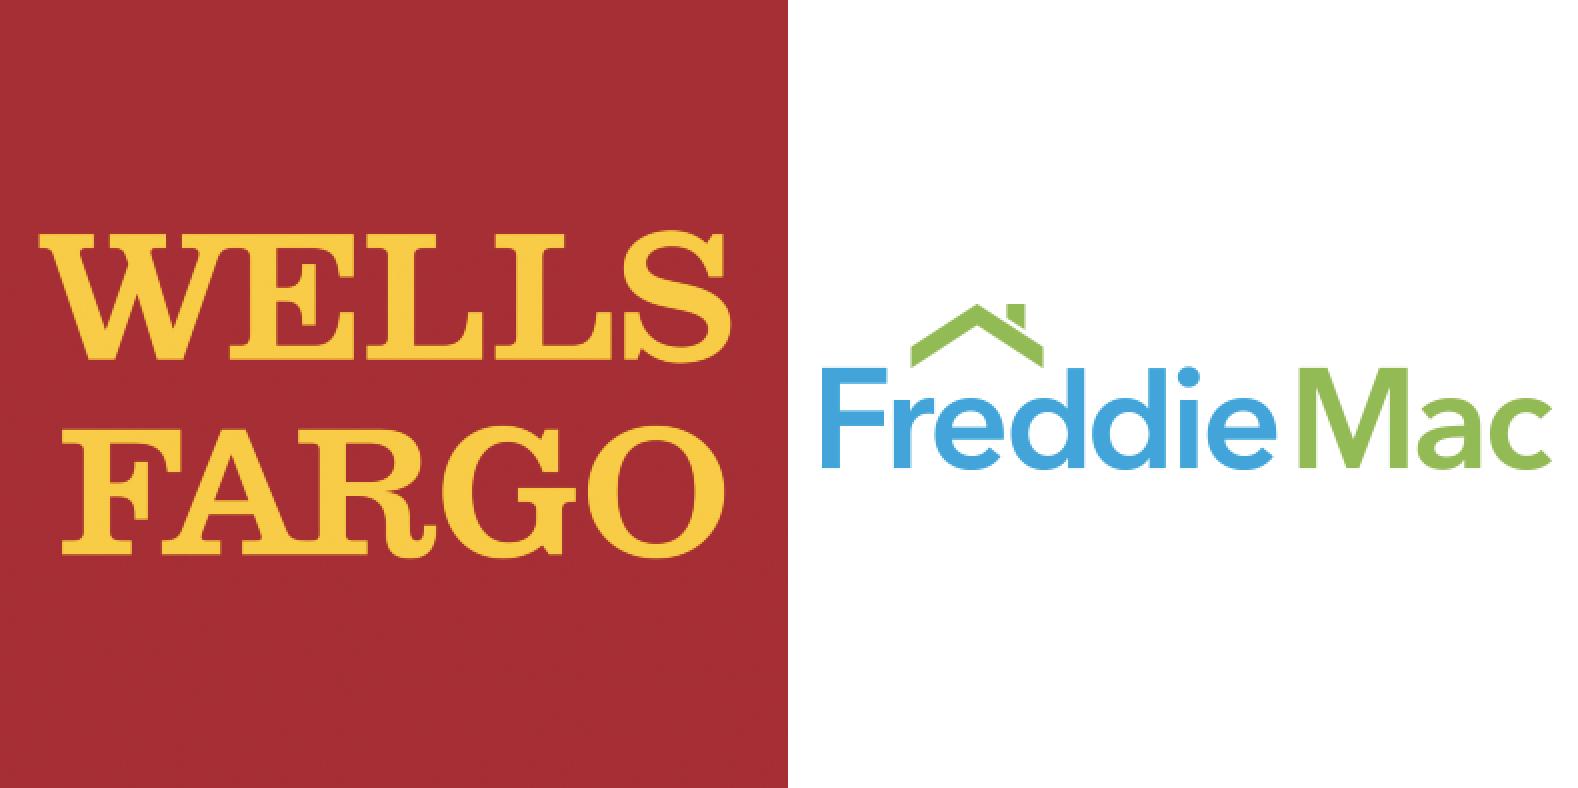 Wells Fargo – Freddie Mac Economic Forum